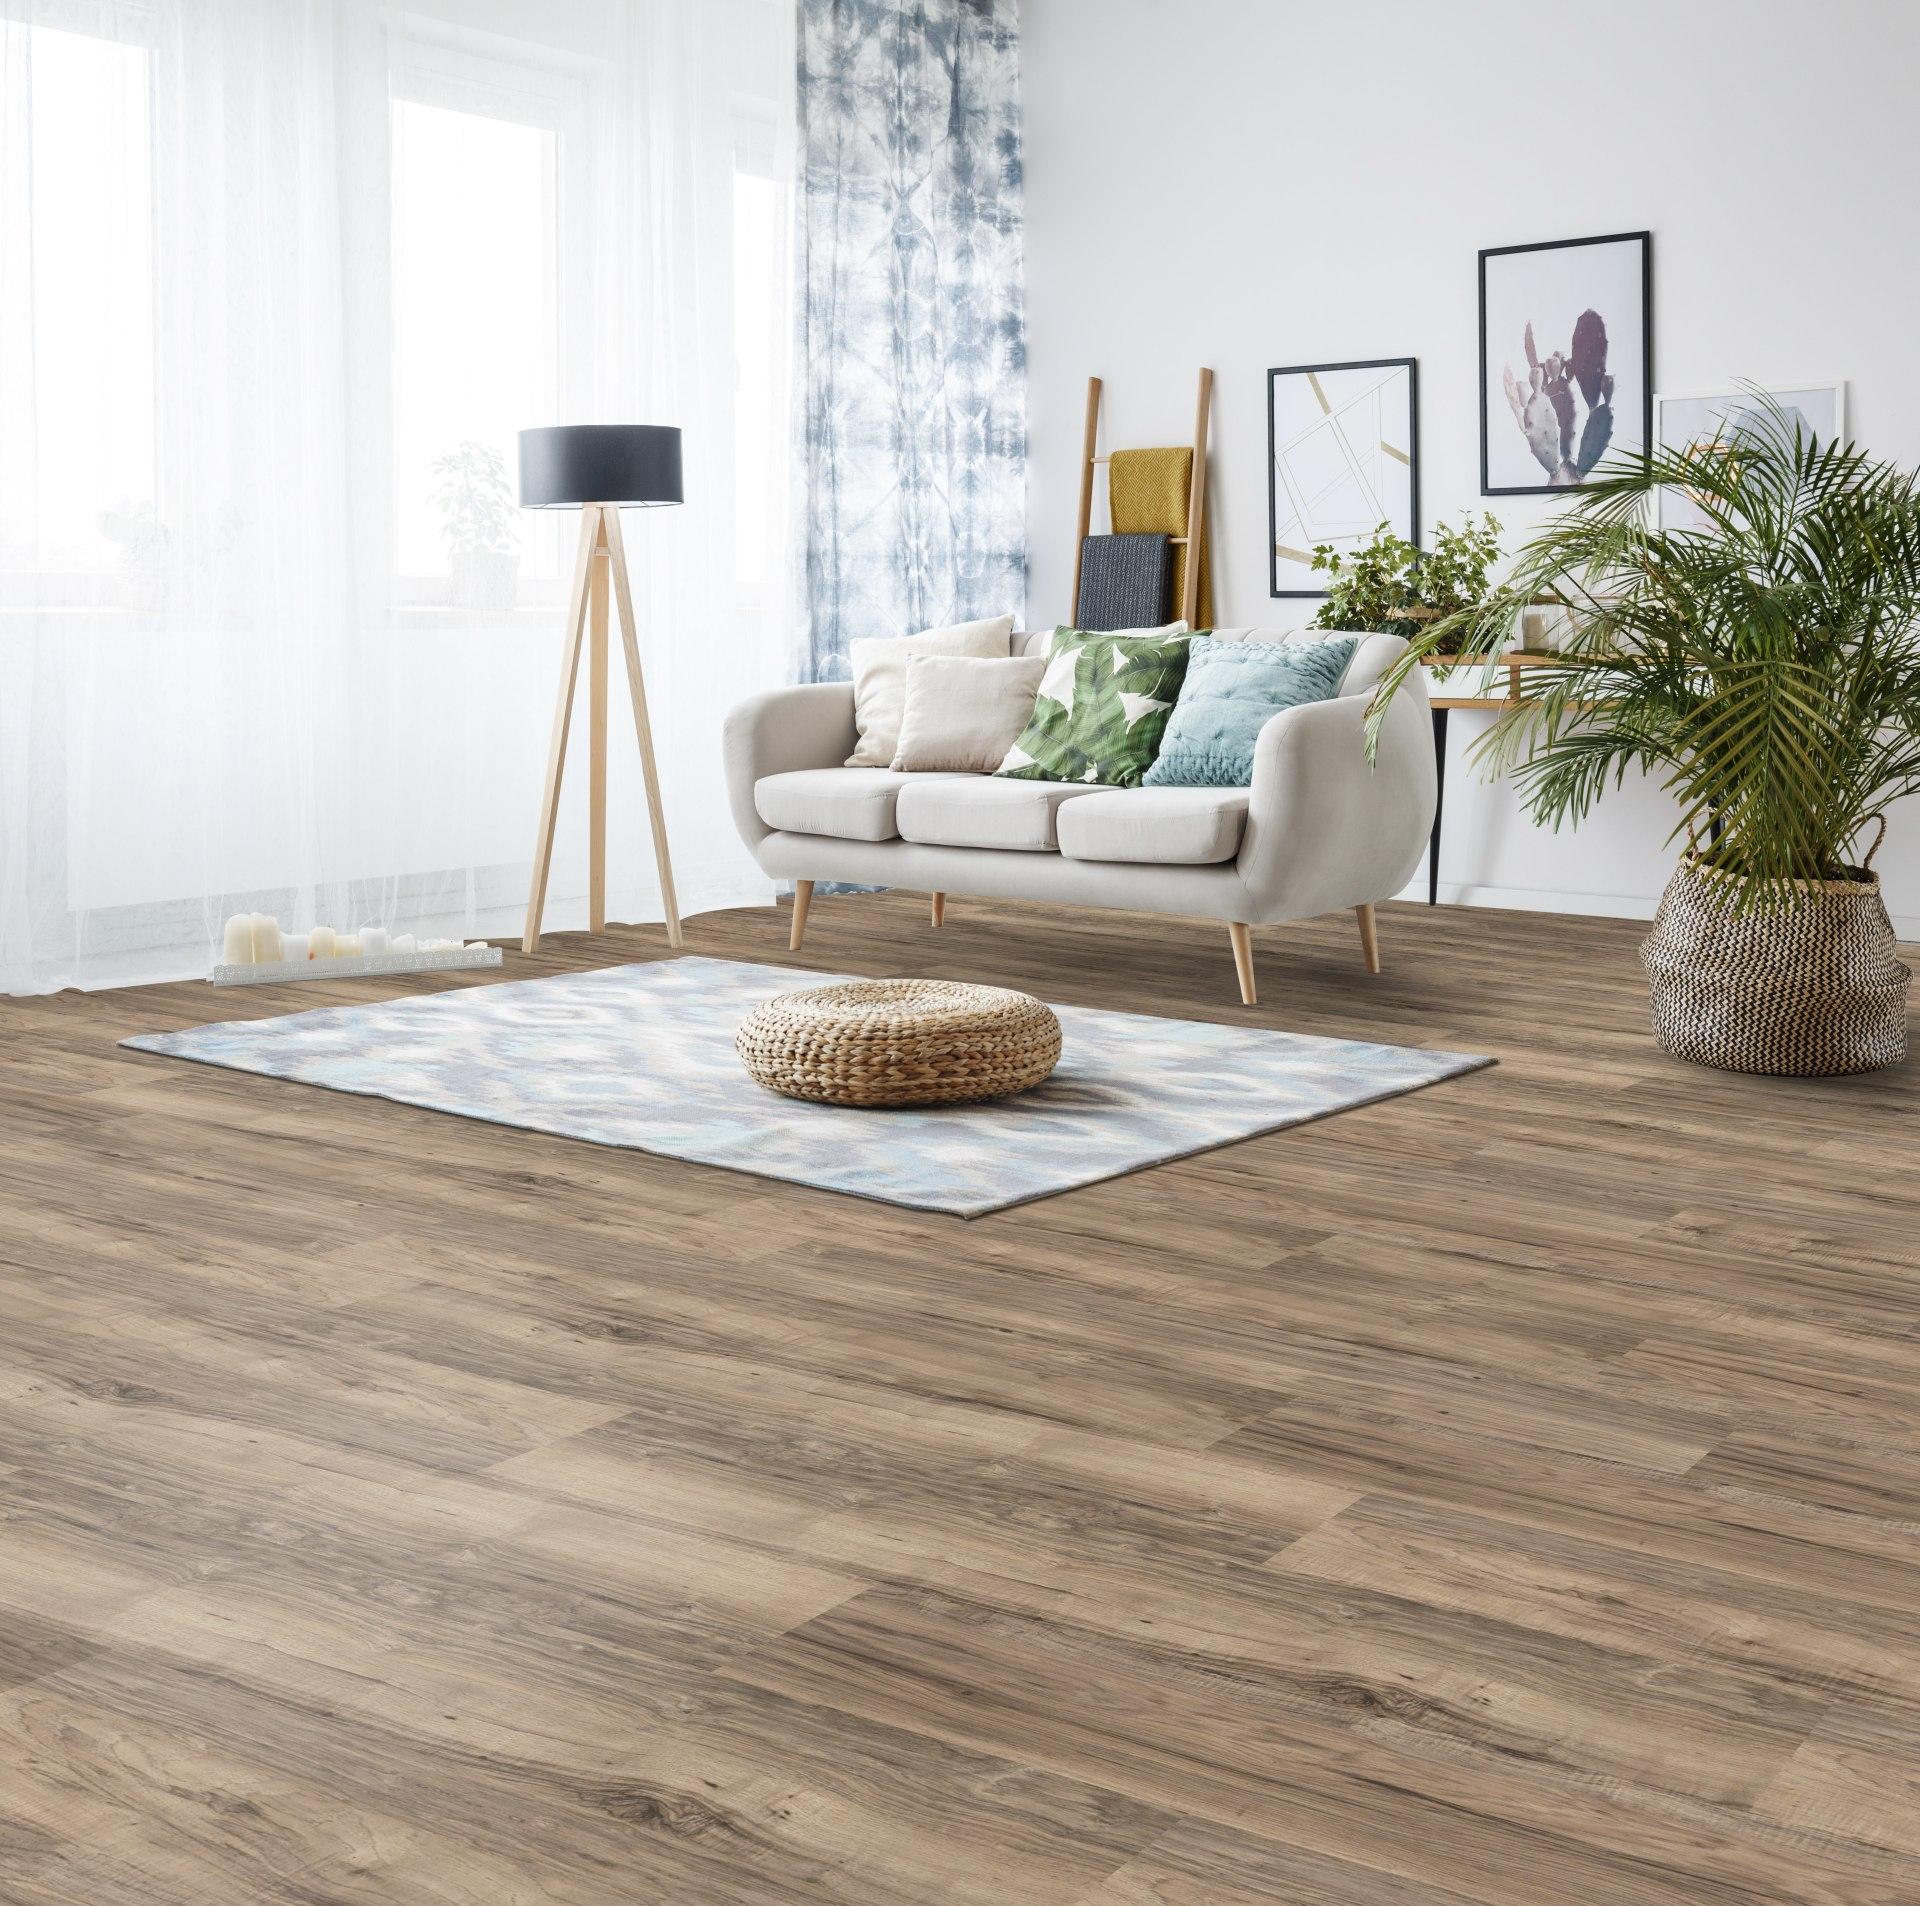 Golden Select Sandstone 19 2 Cm 7 56, 15mm Laminate Flooring Canada